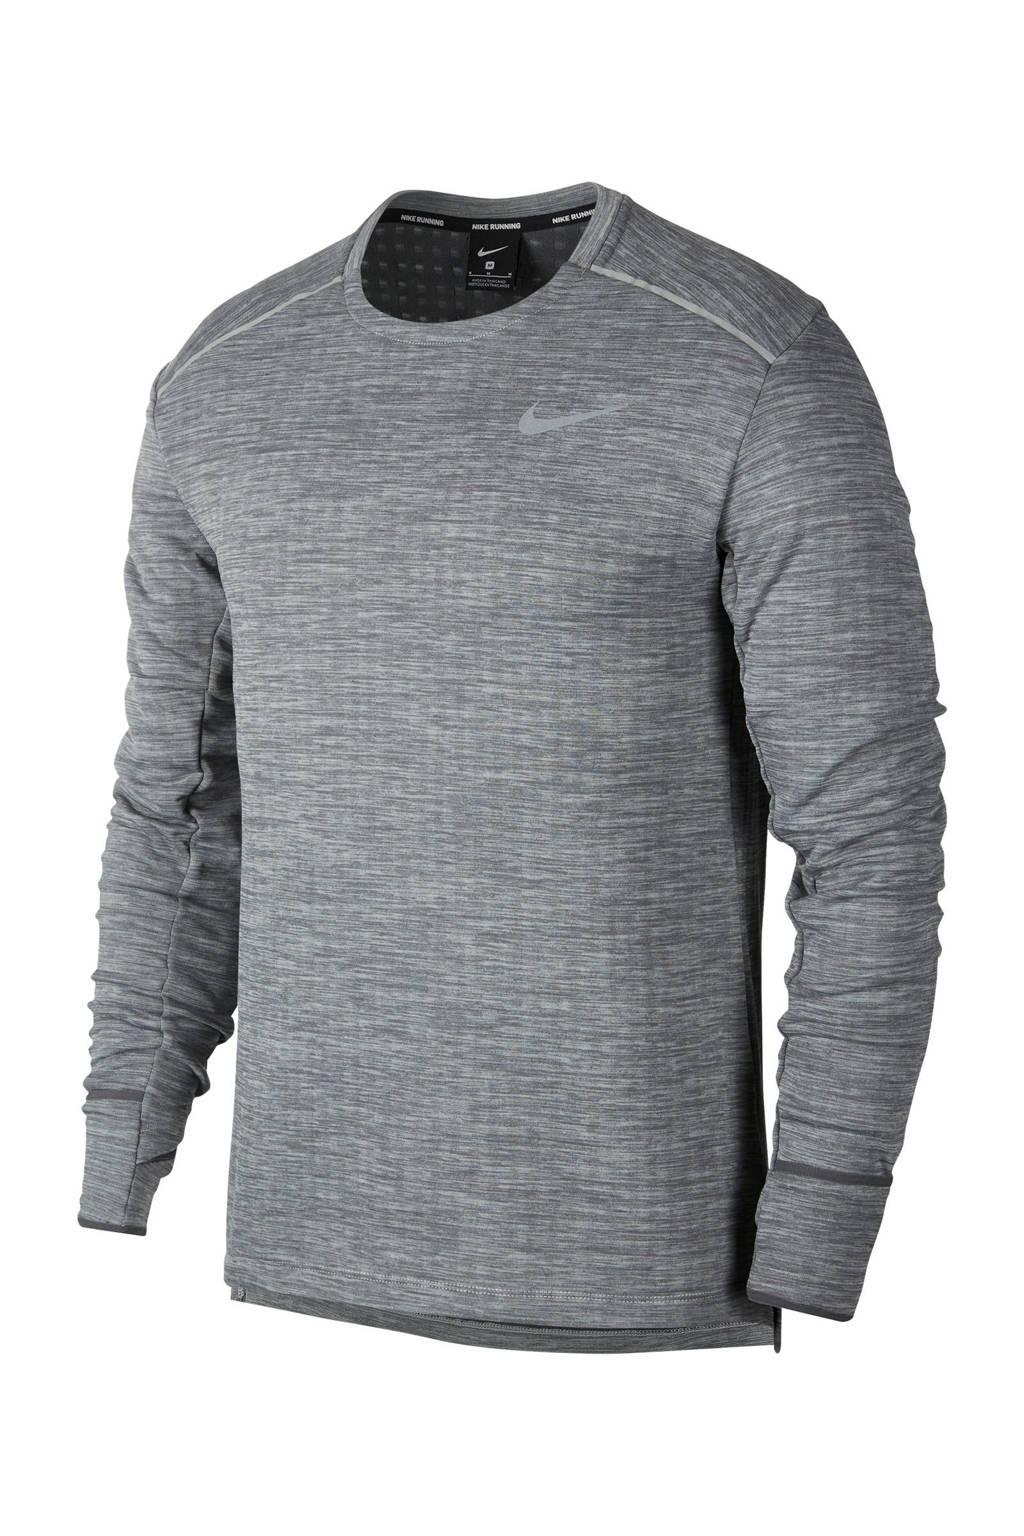 Nike   thermo hardloop T-shirt grijs, Grijs